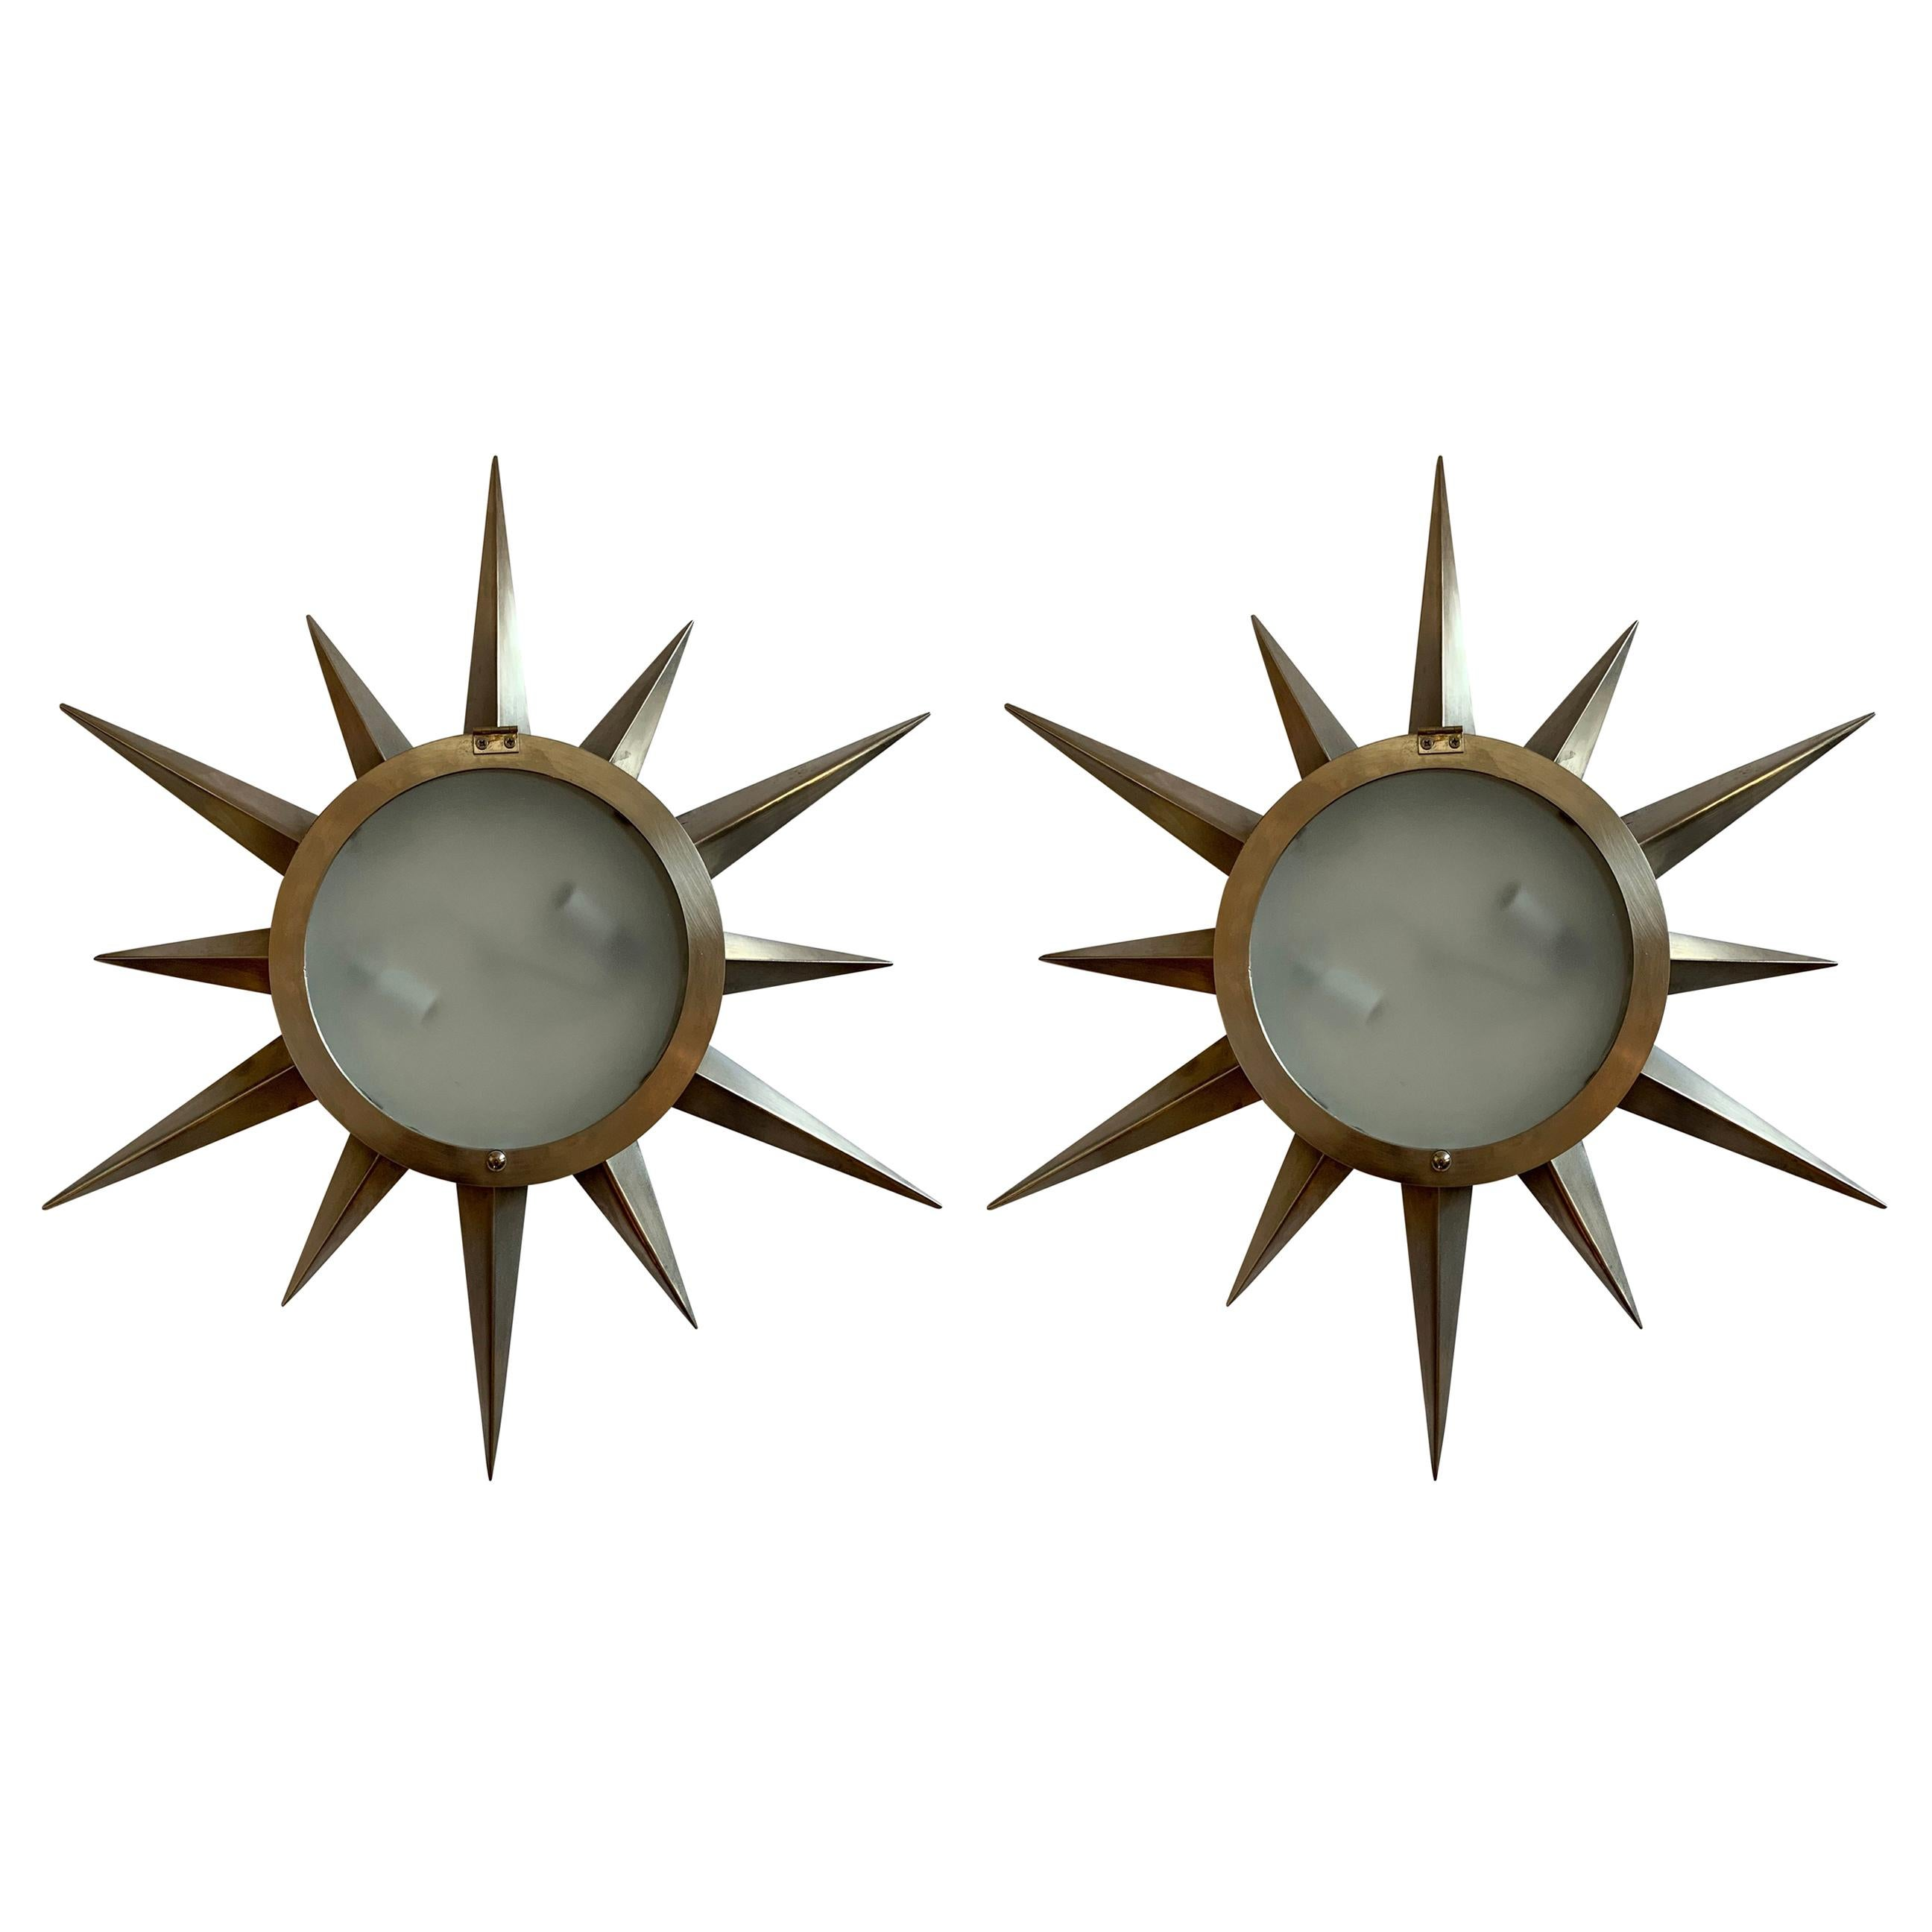 Fine Mid-Century Modern Brushed Brass Star Glass Flush Mount Light Fixture, Pair